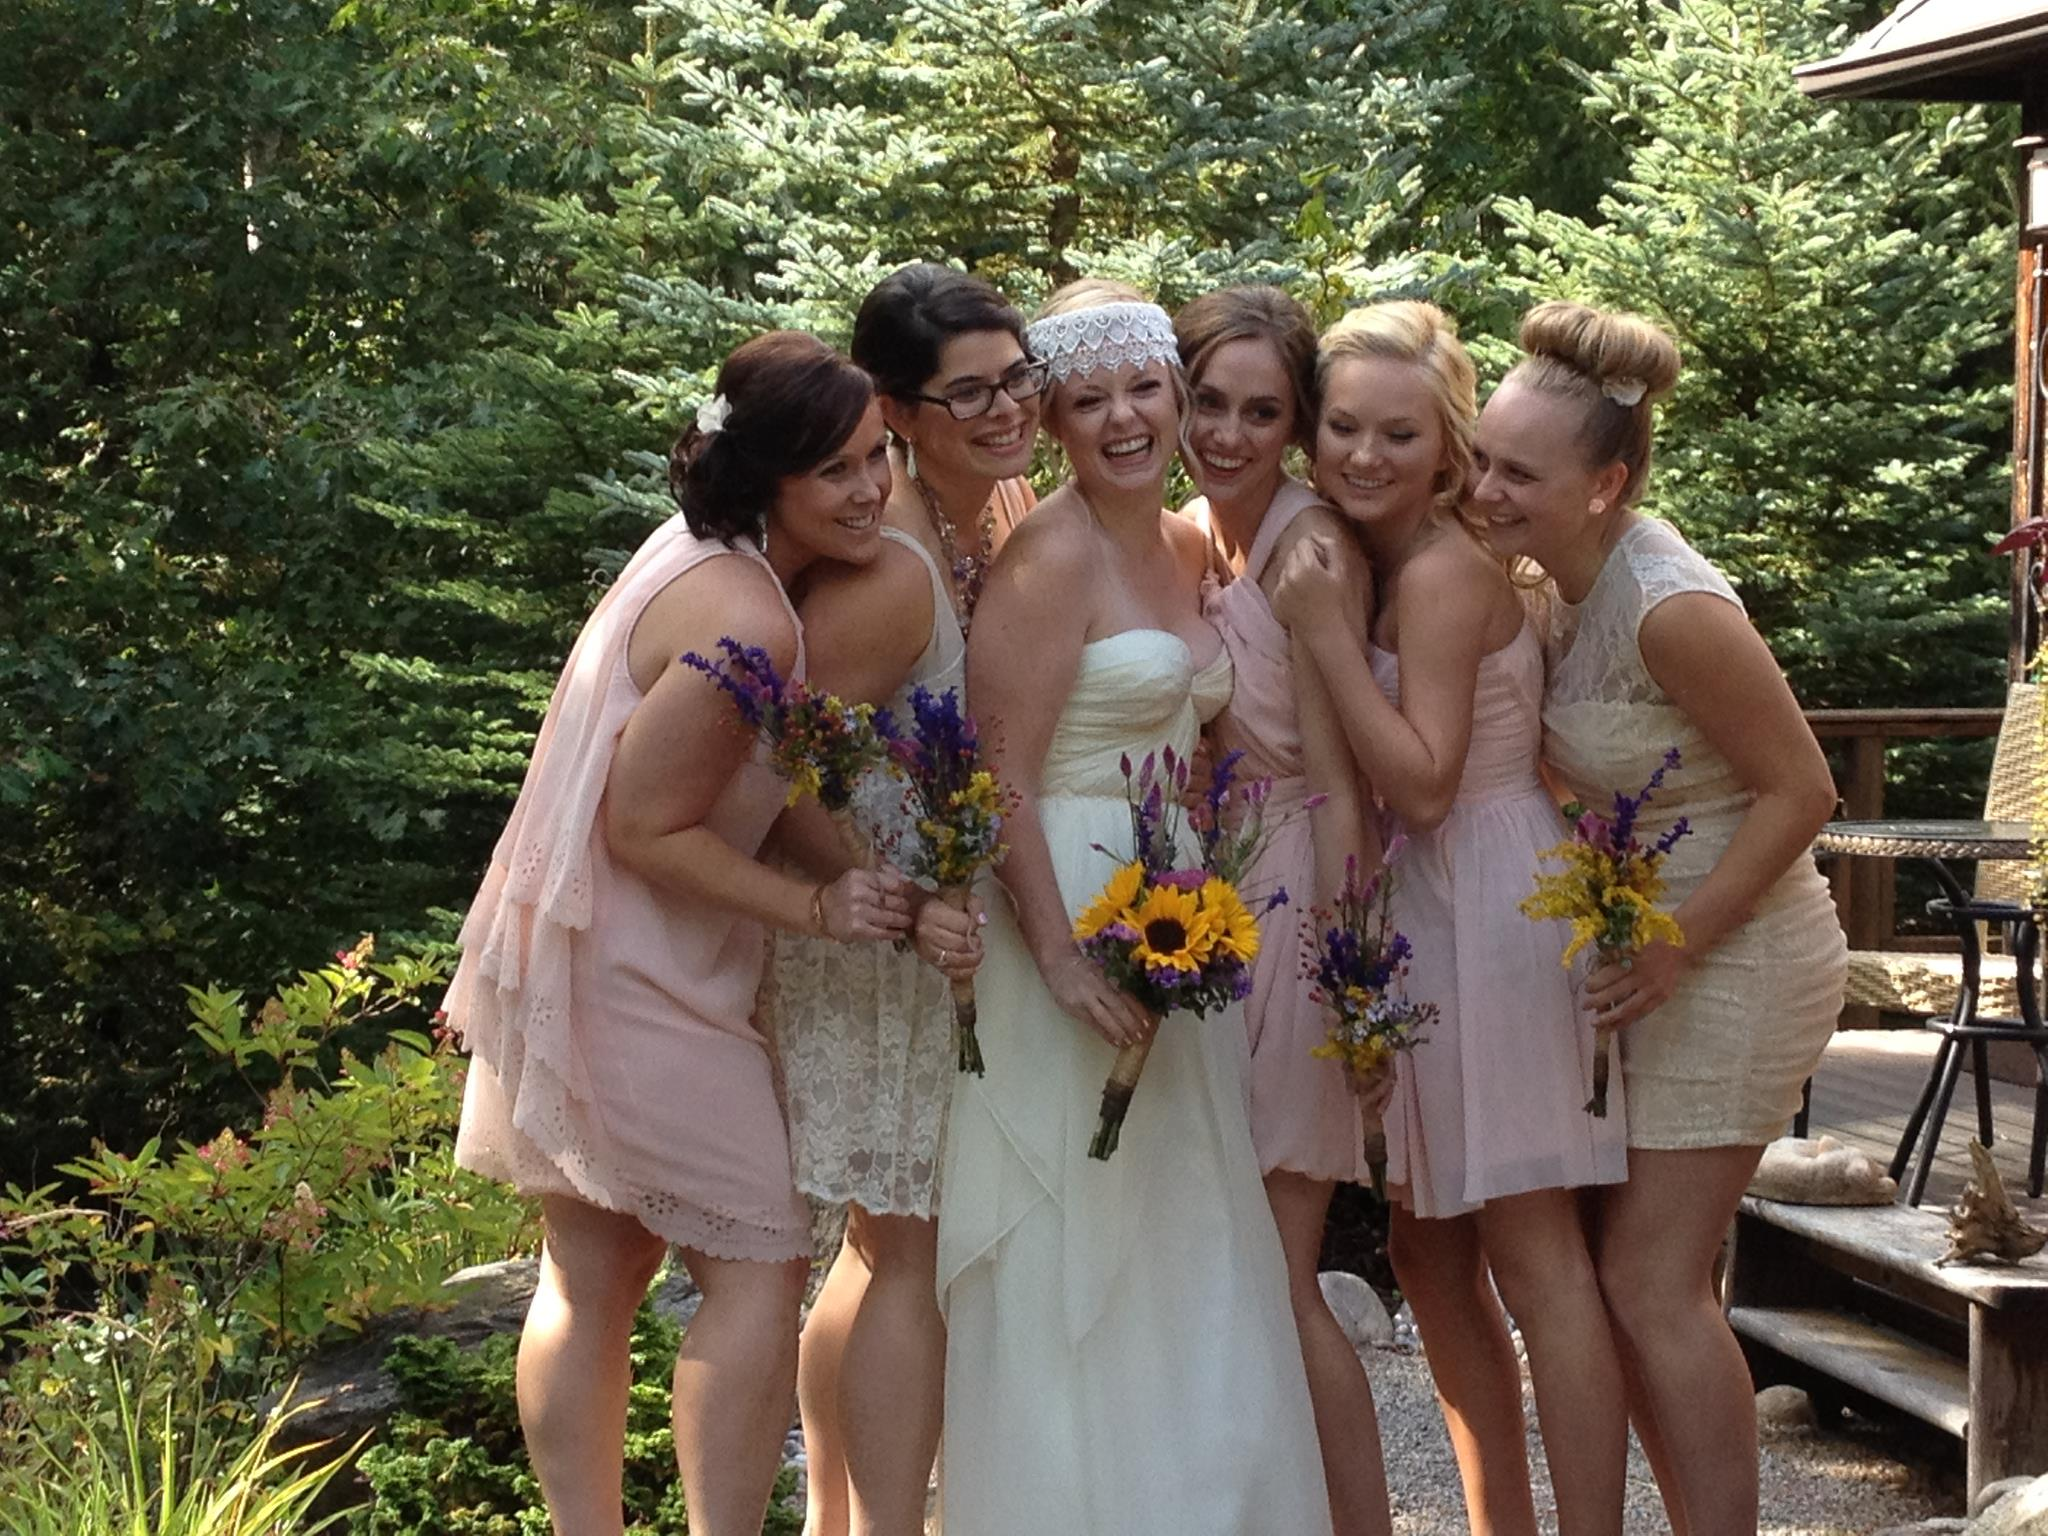 Property Brothers Wedding.My Best Friend S Wedding